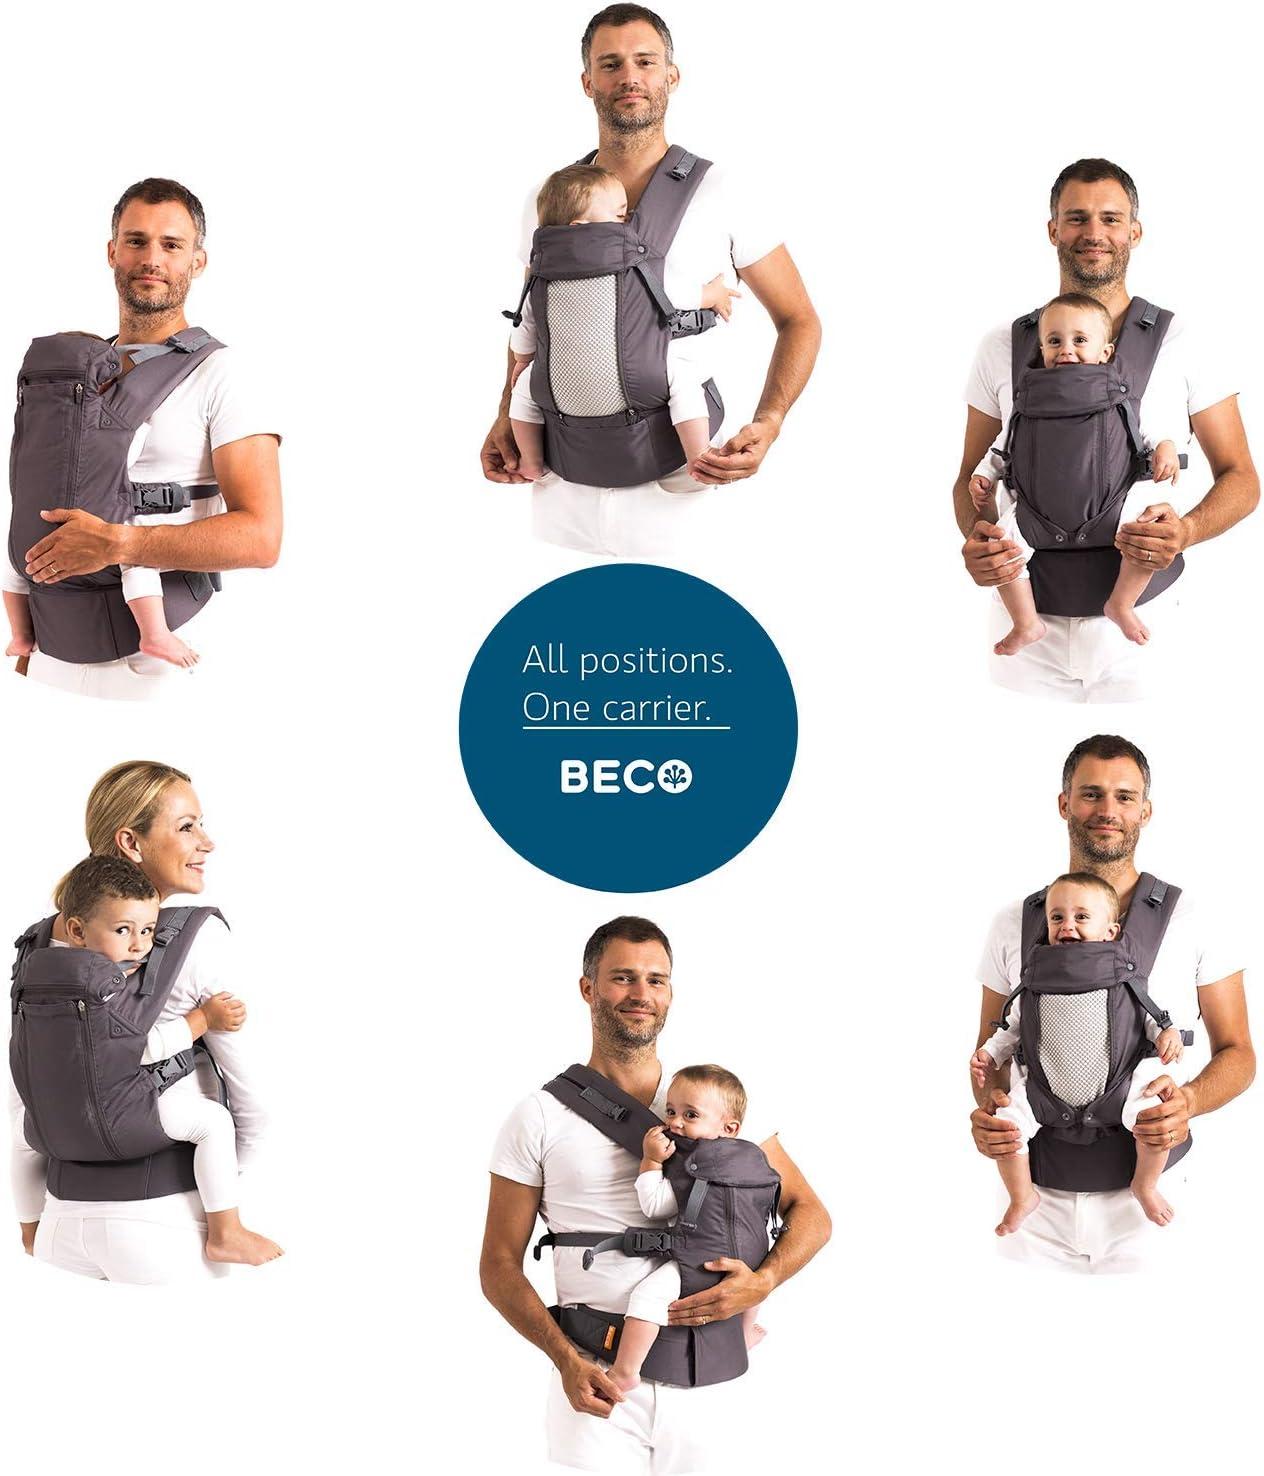 Mochila portabeb/és Beco 8 parte trasera ventilada, incluye accesorio para reci/én nacidos color gris oscuro